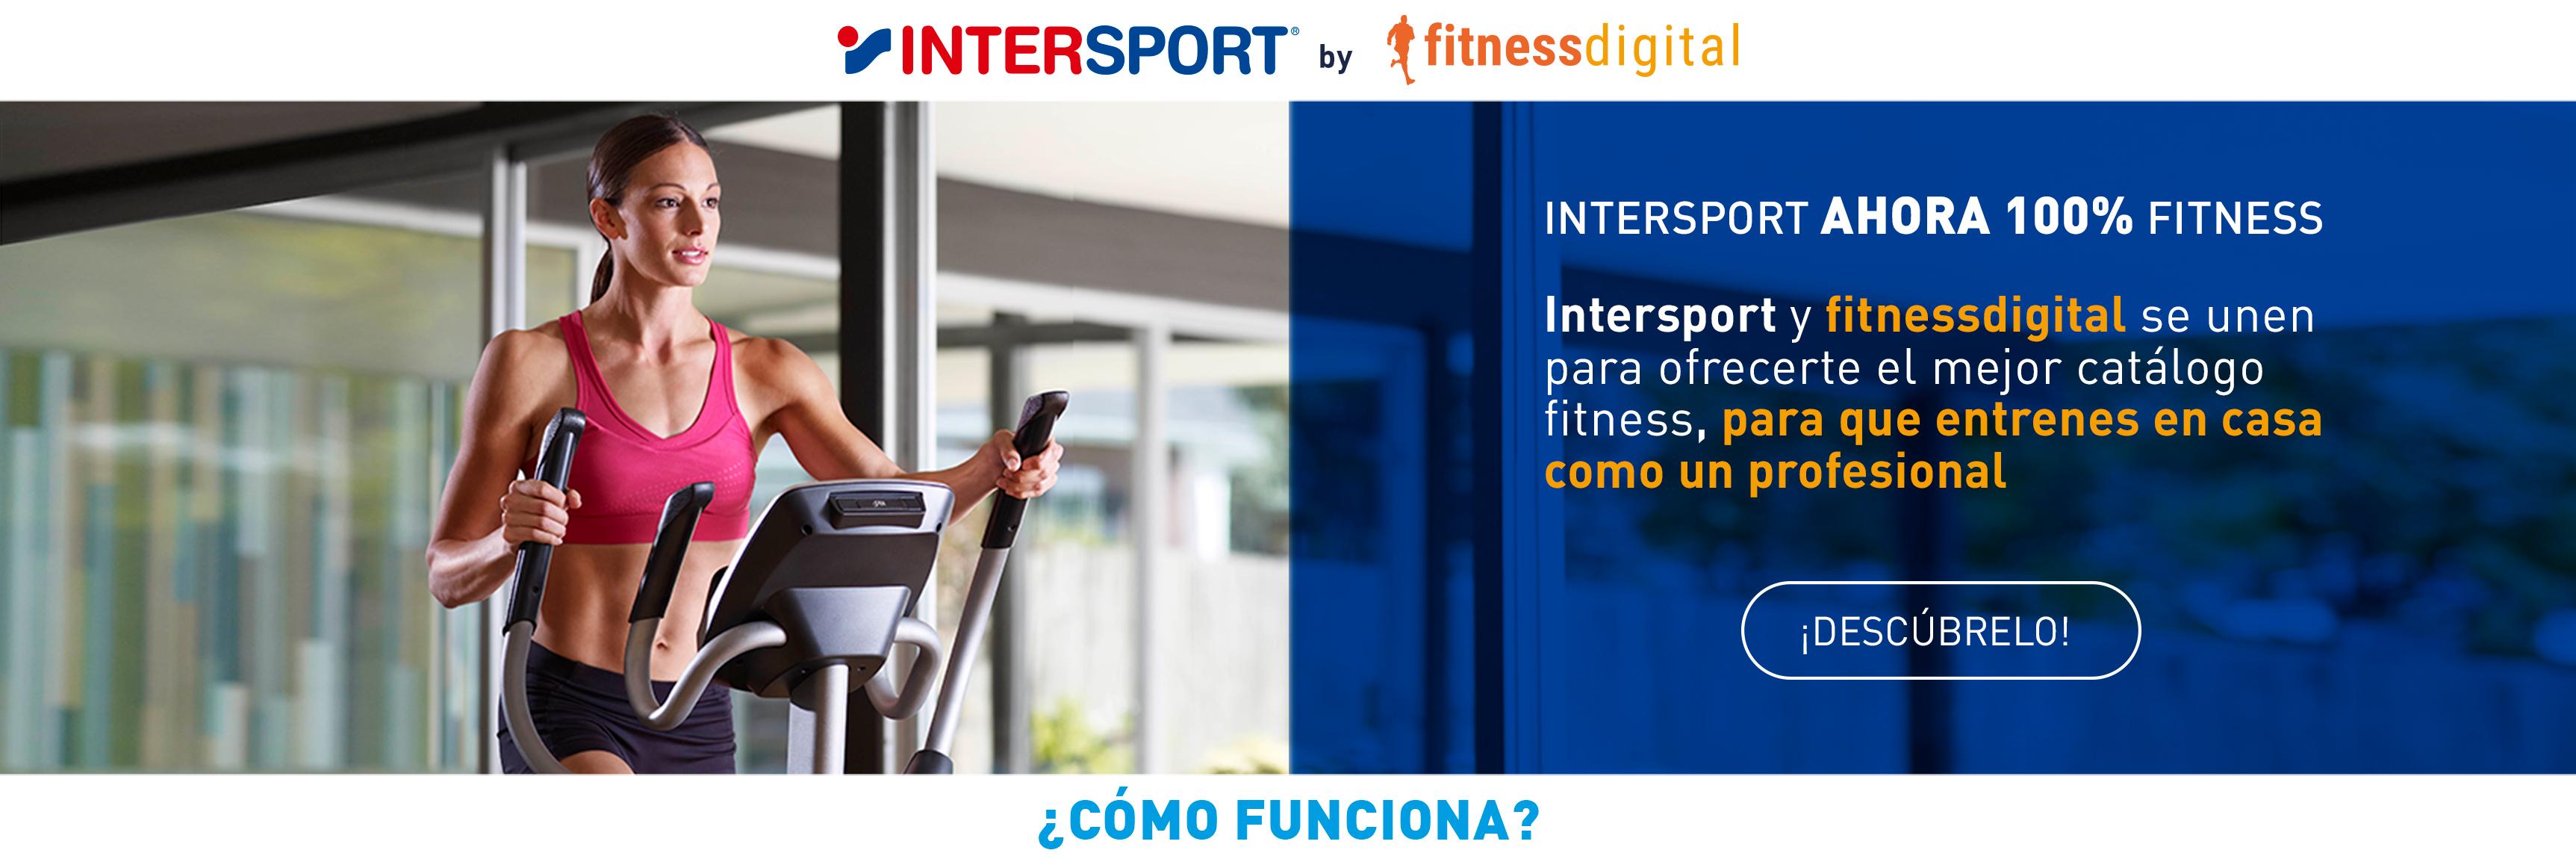 Imagen principal página fitness digital